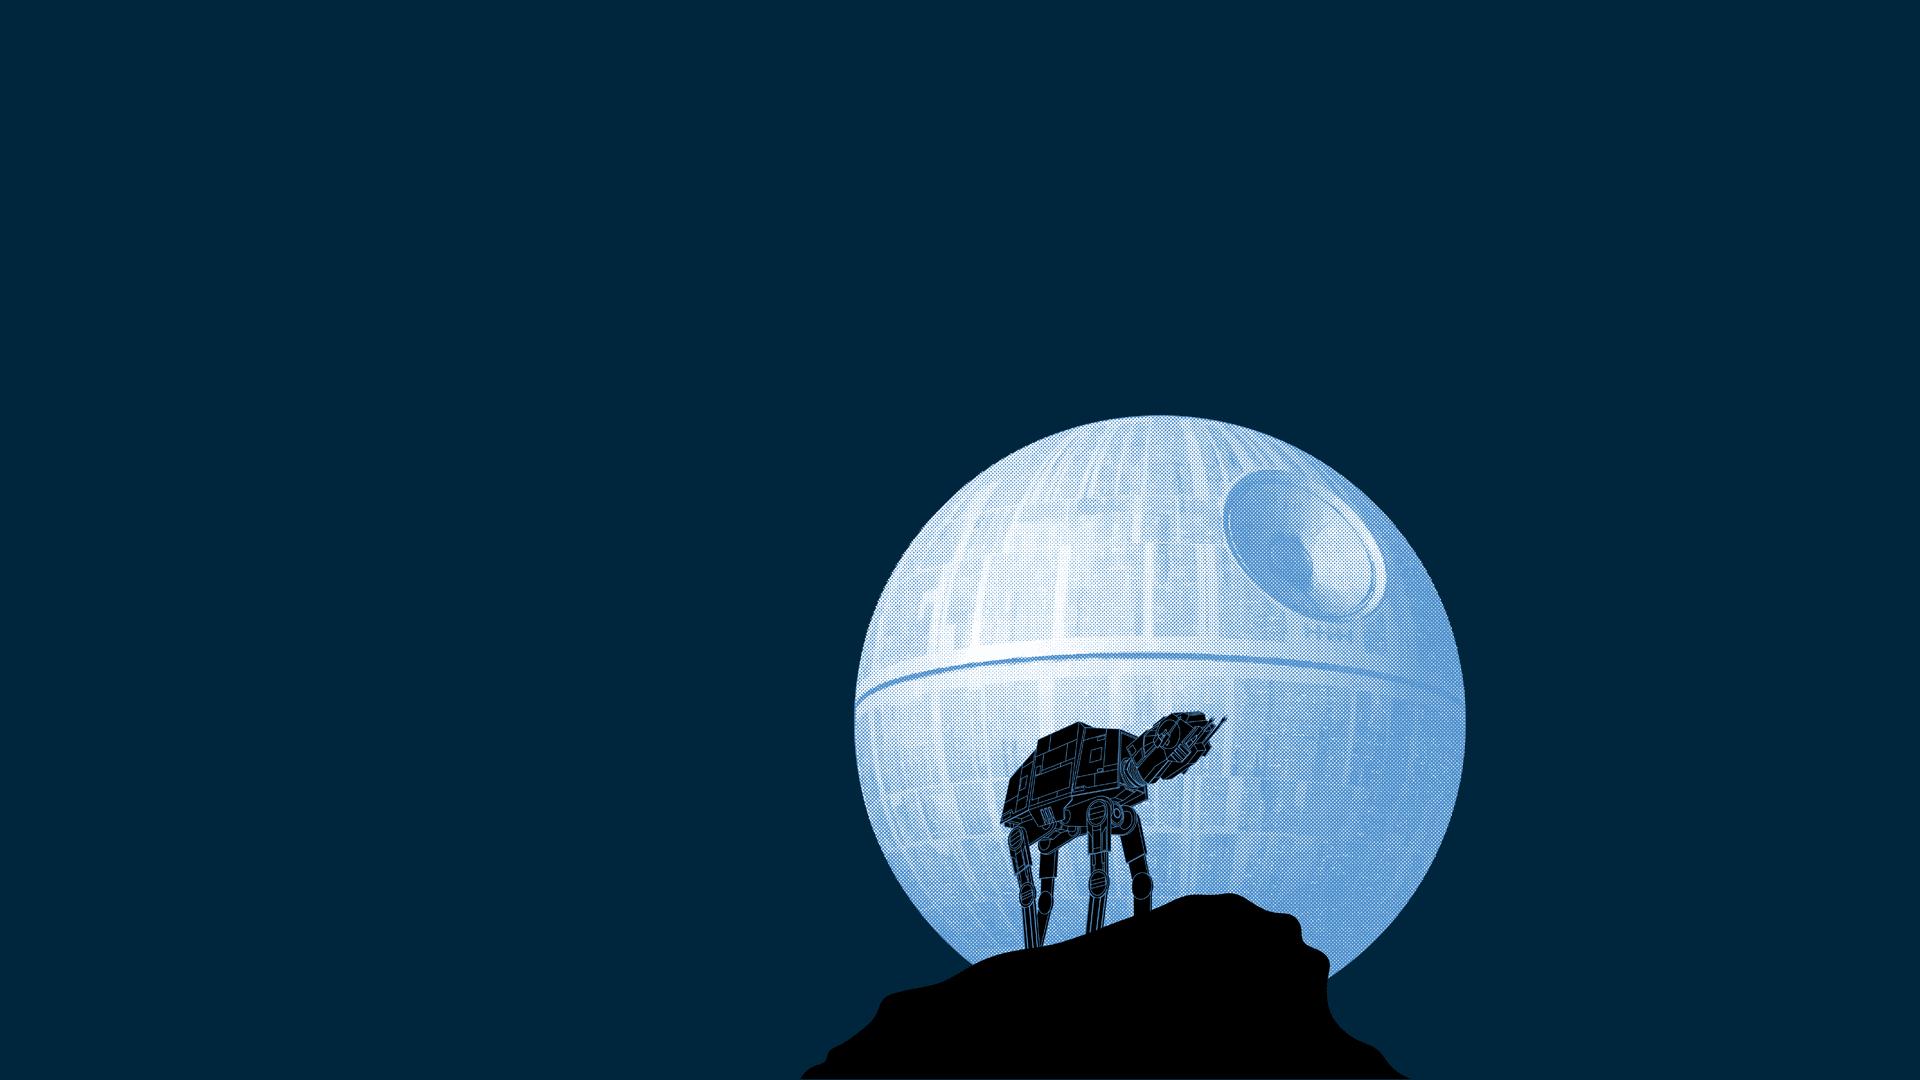 Death Star Walker Blue Moon star wars humor wallpaper 1920x1080 1920x1080